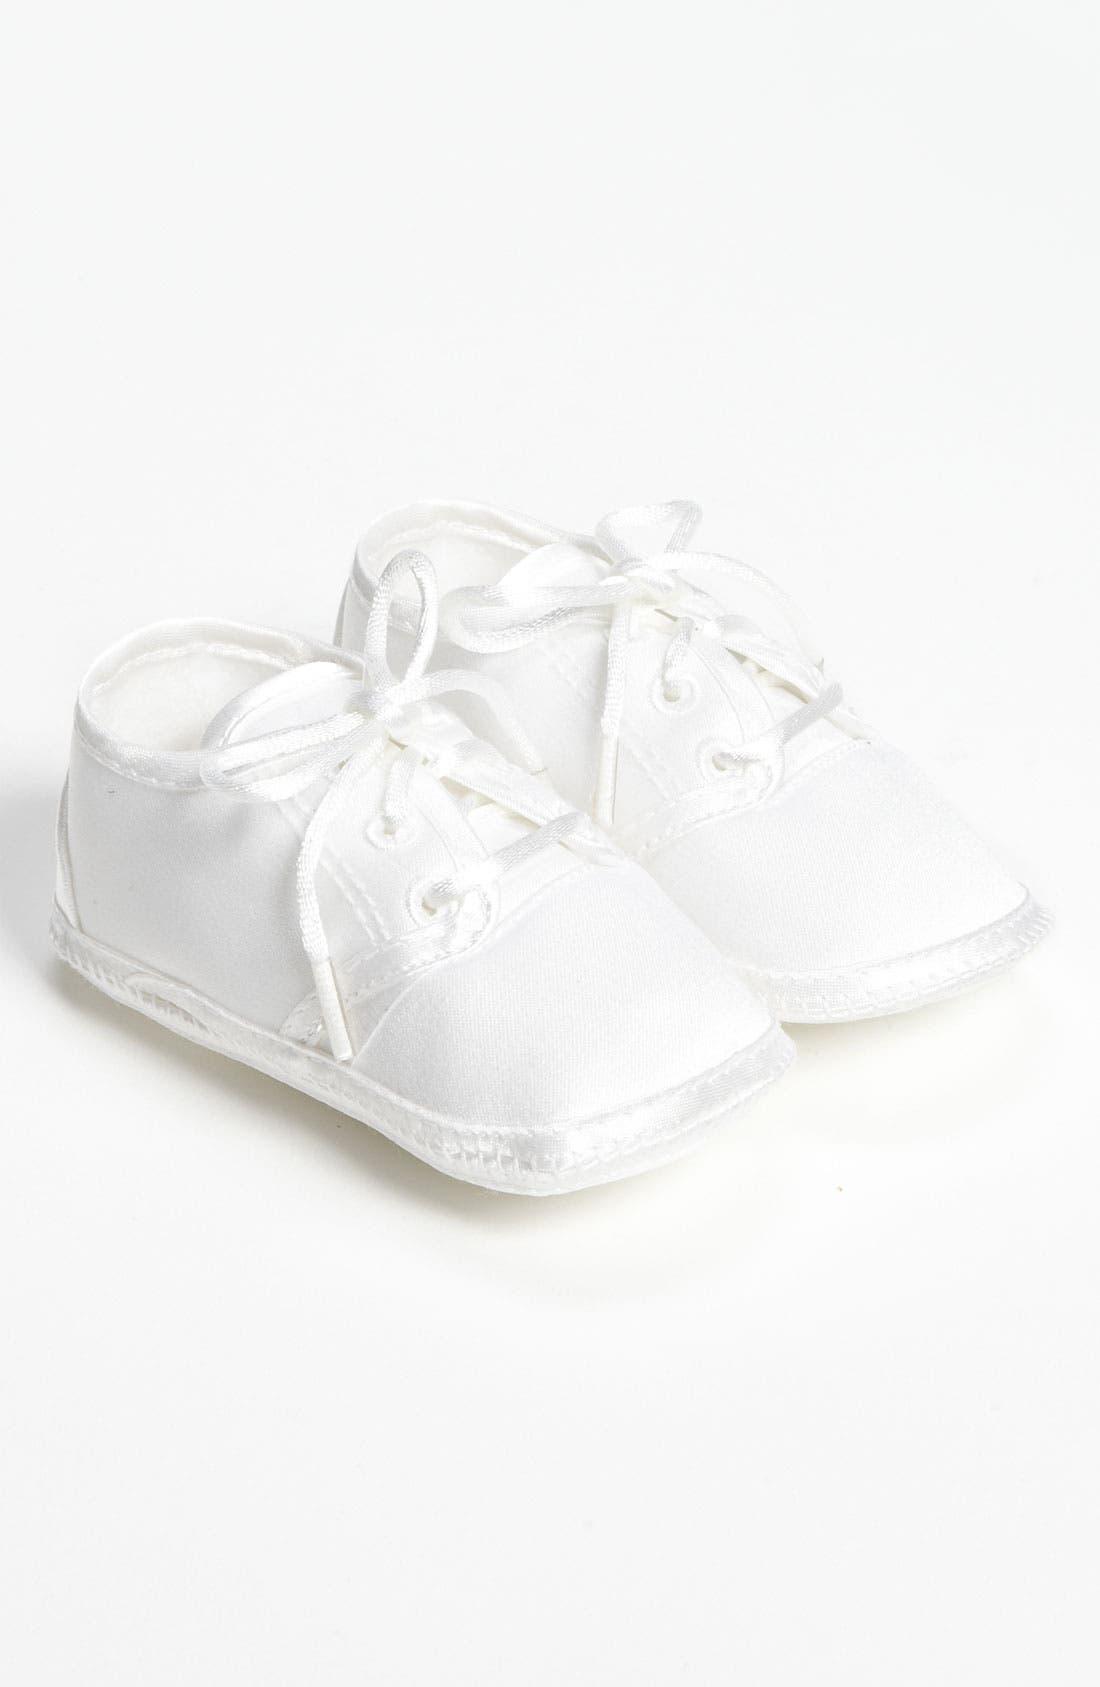 LITTLE THINGS MEAN A LOT Matte Satin Shoe